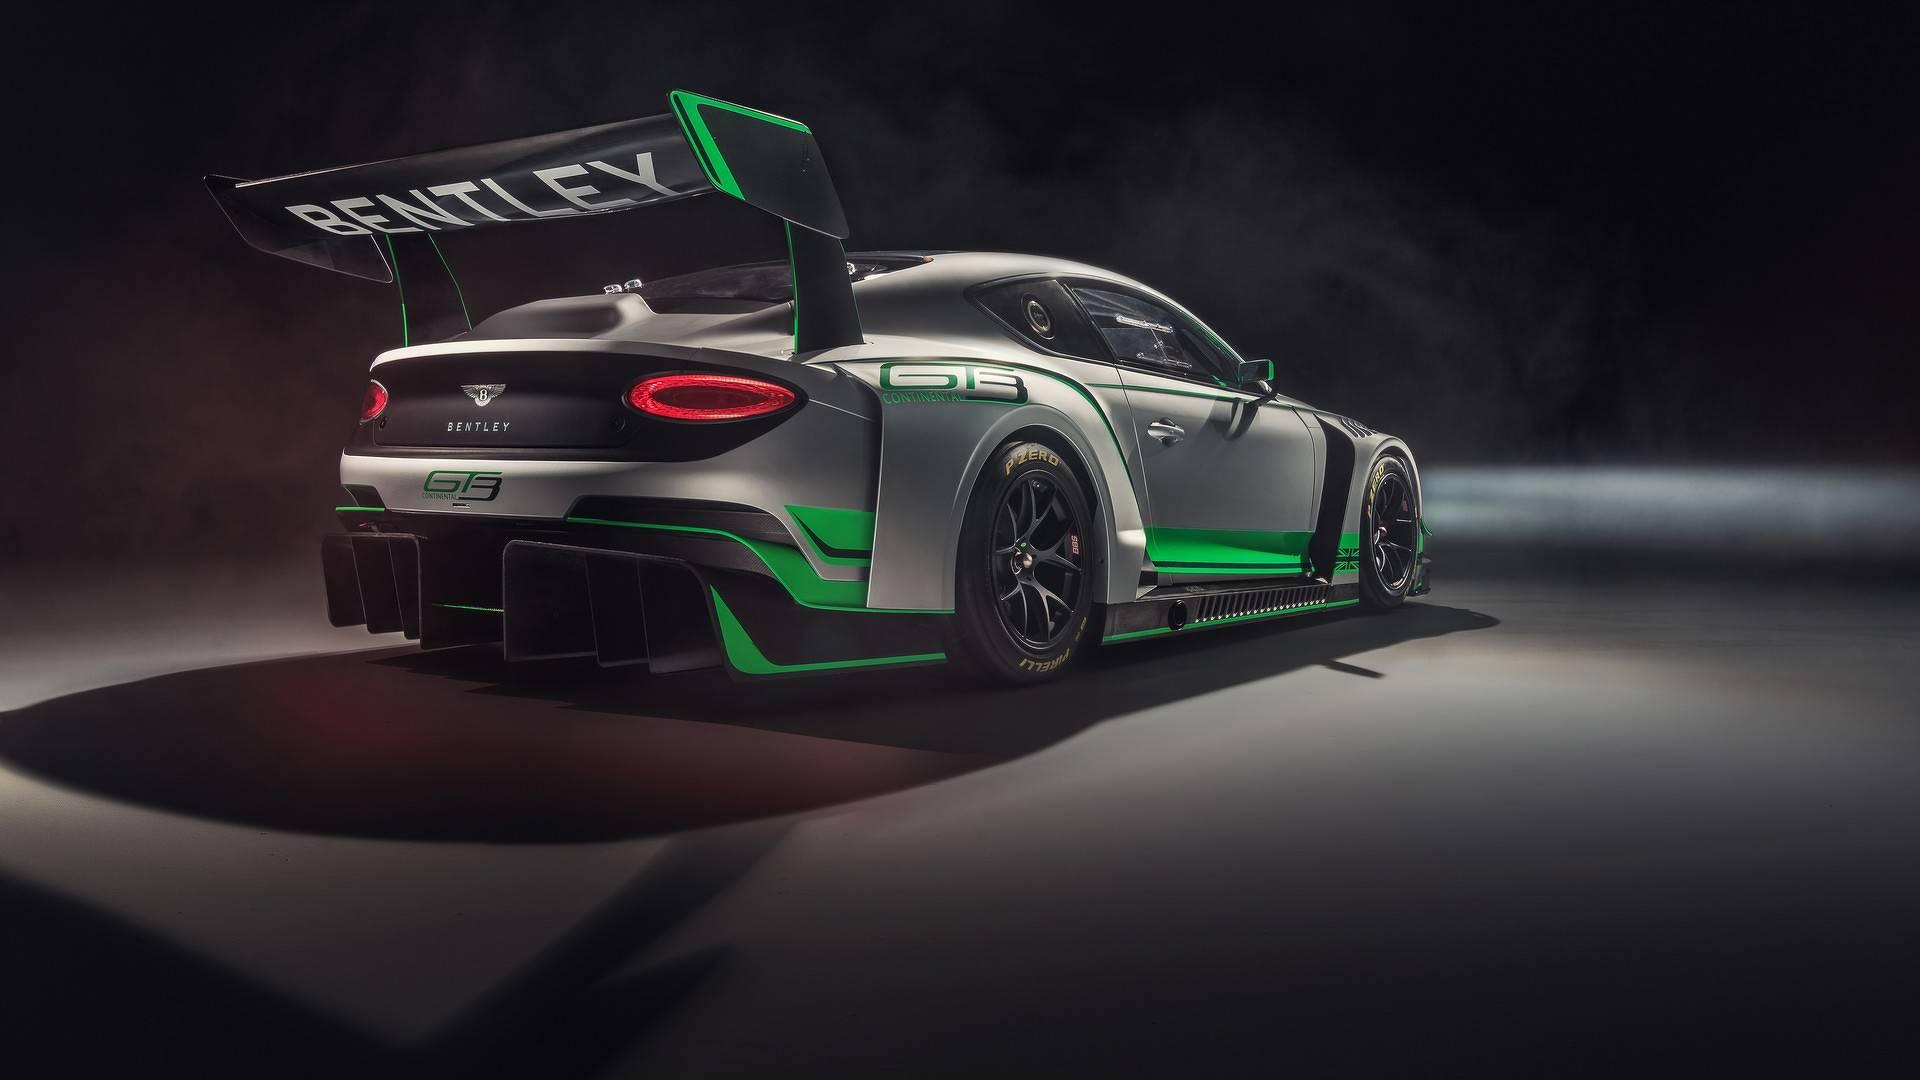 2018-bentley-continental-gt3-race-car (4)